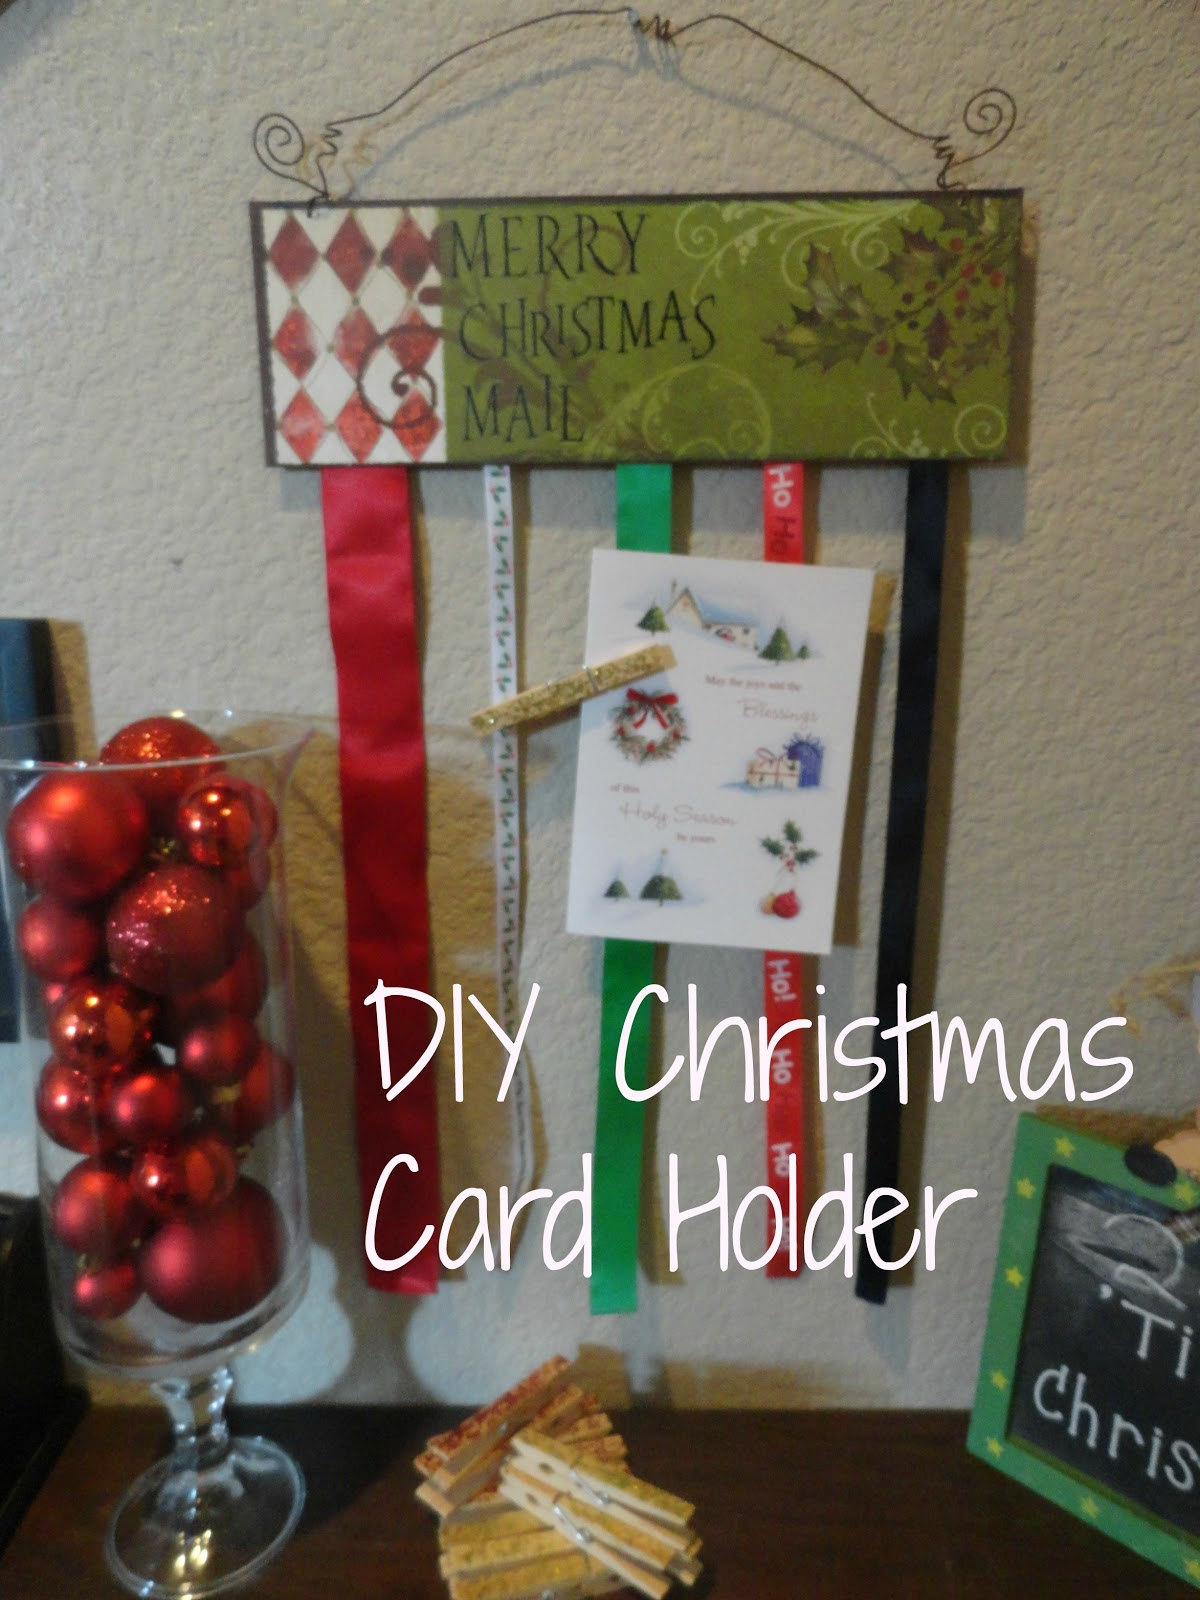 So I Saw This Tutorial Diy Christmas Card Holder